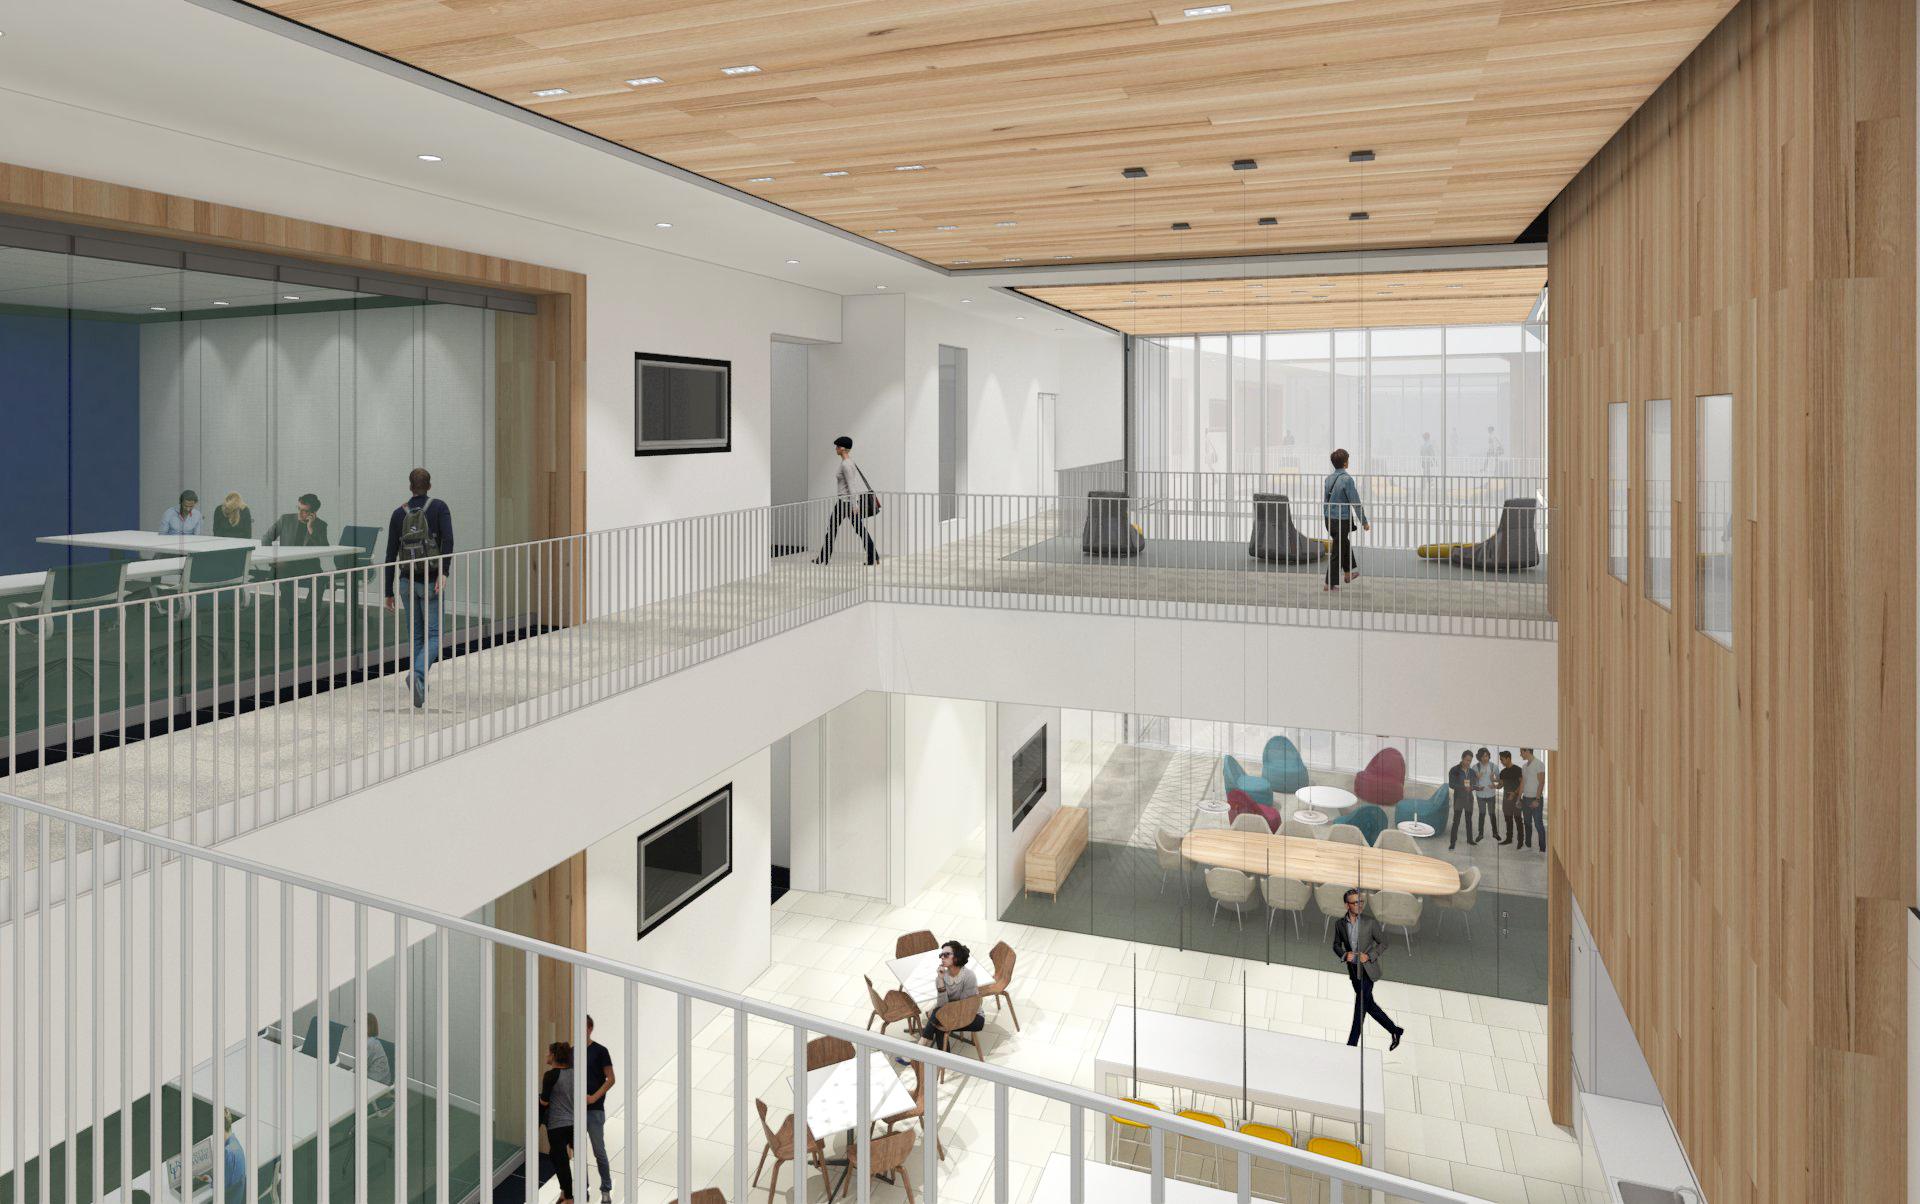 University of Delaware's STAR Campus—A Model Innovation Community